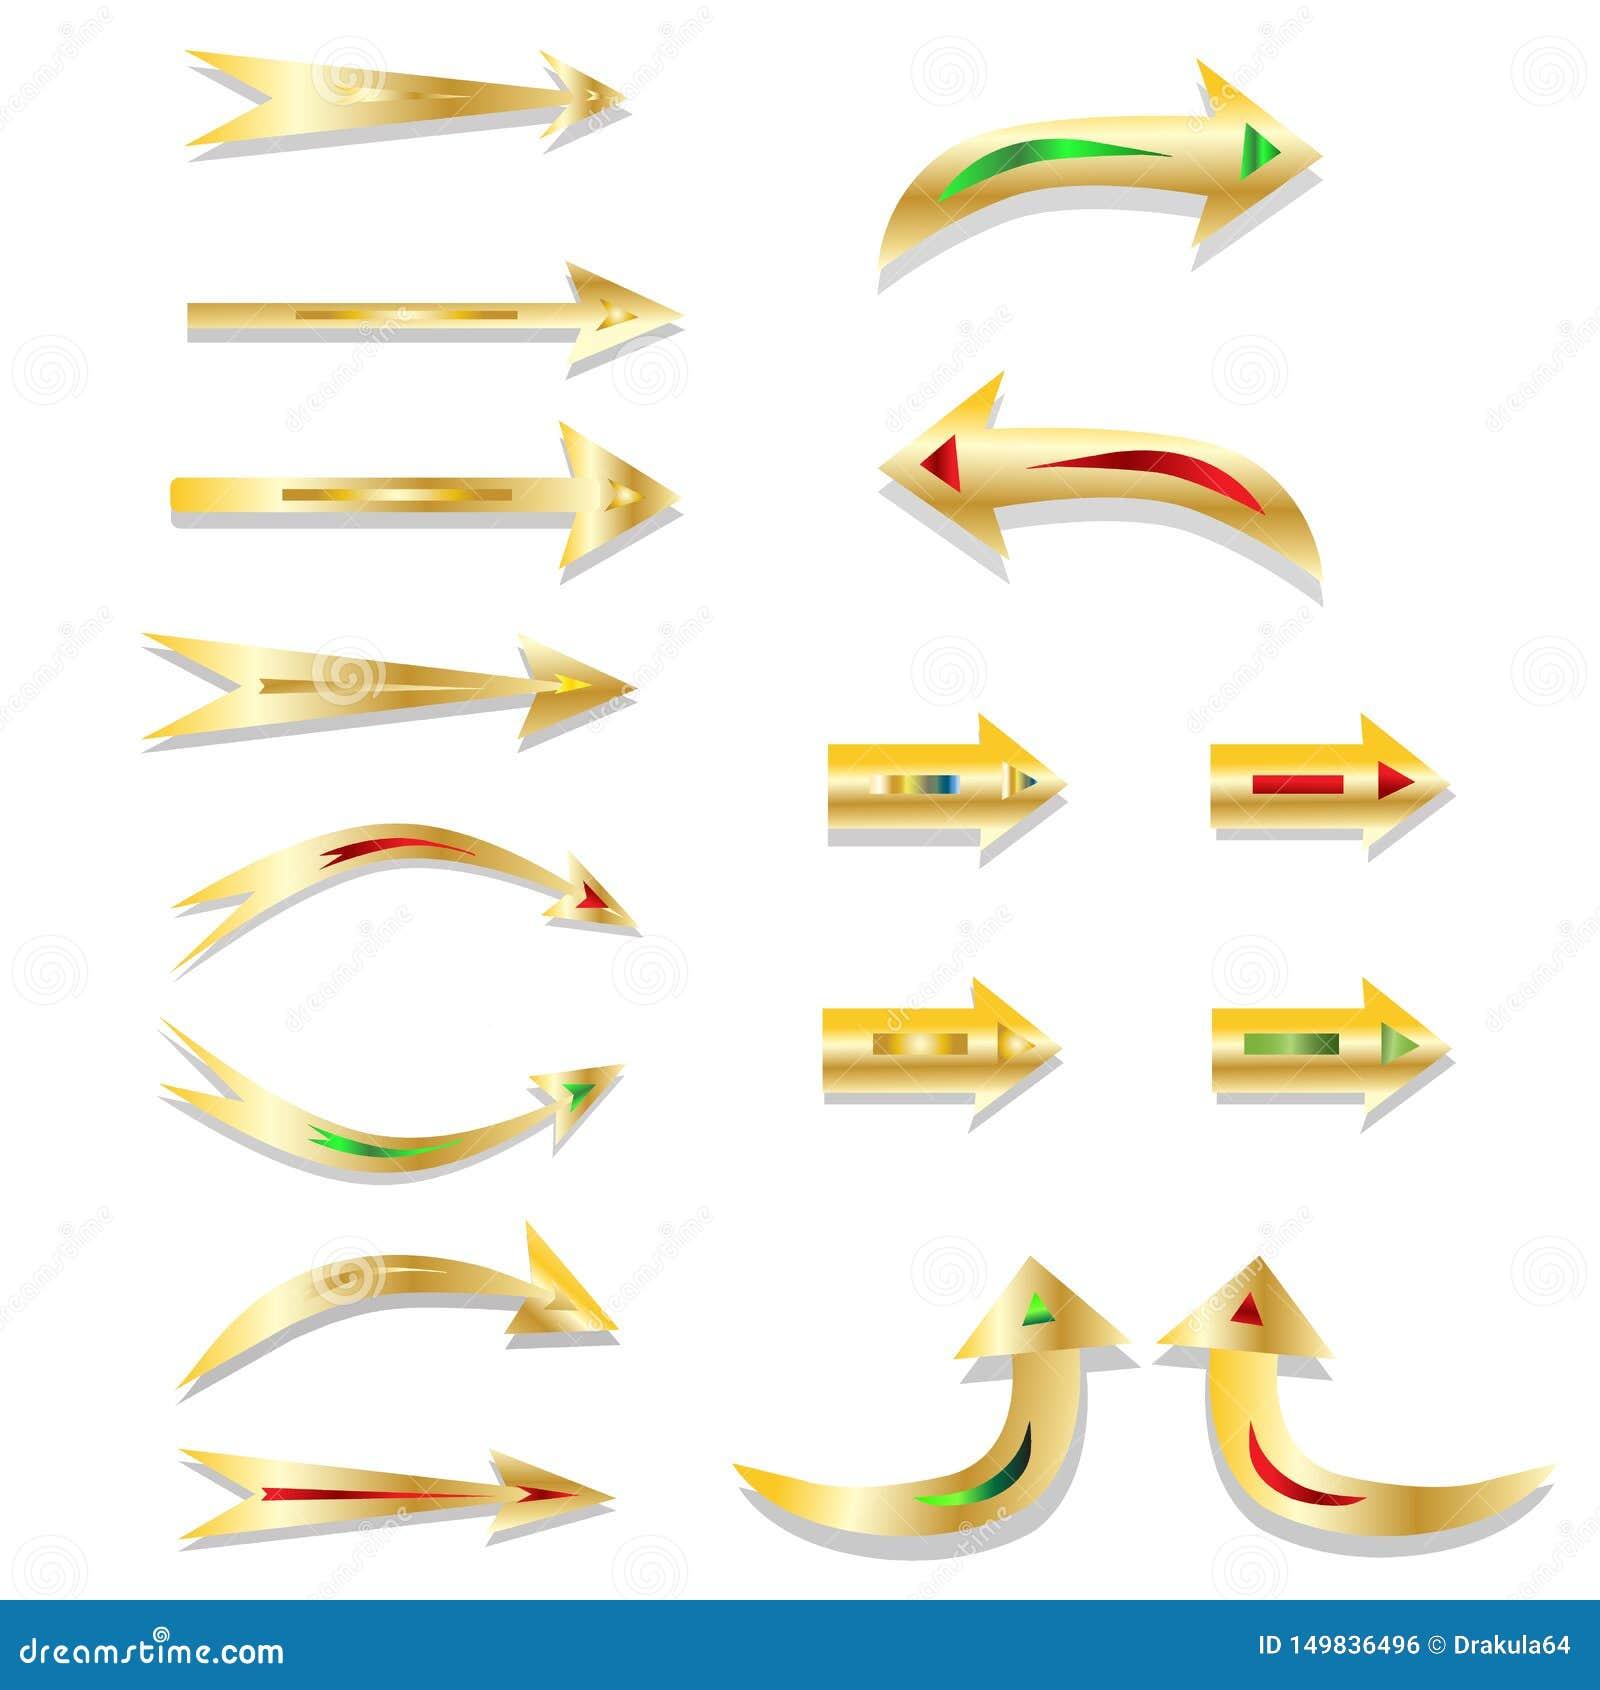 Dekorativ-guld-pil-pekare